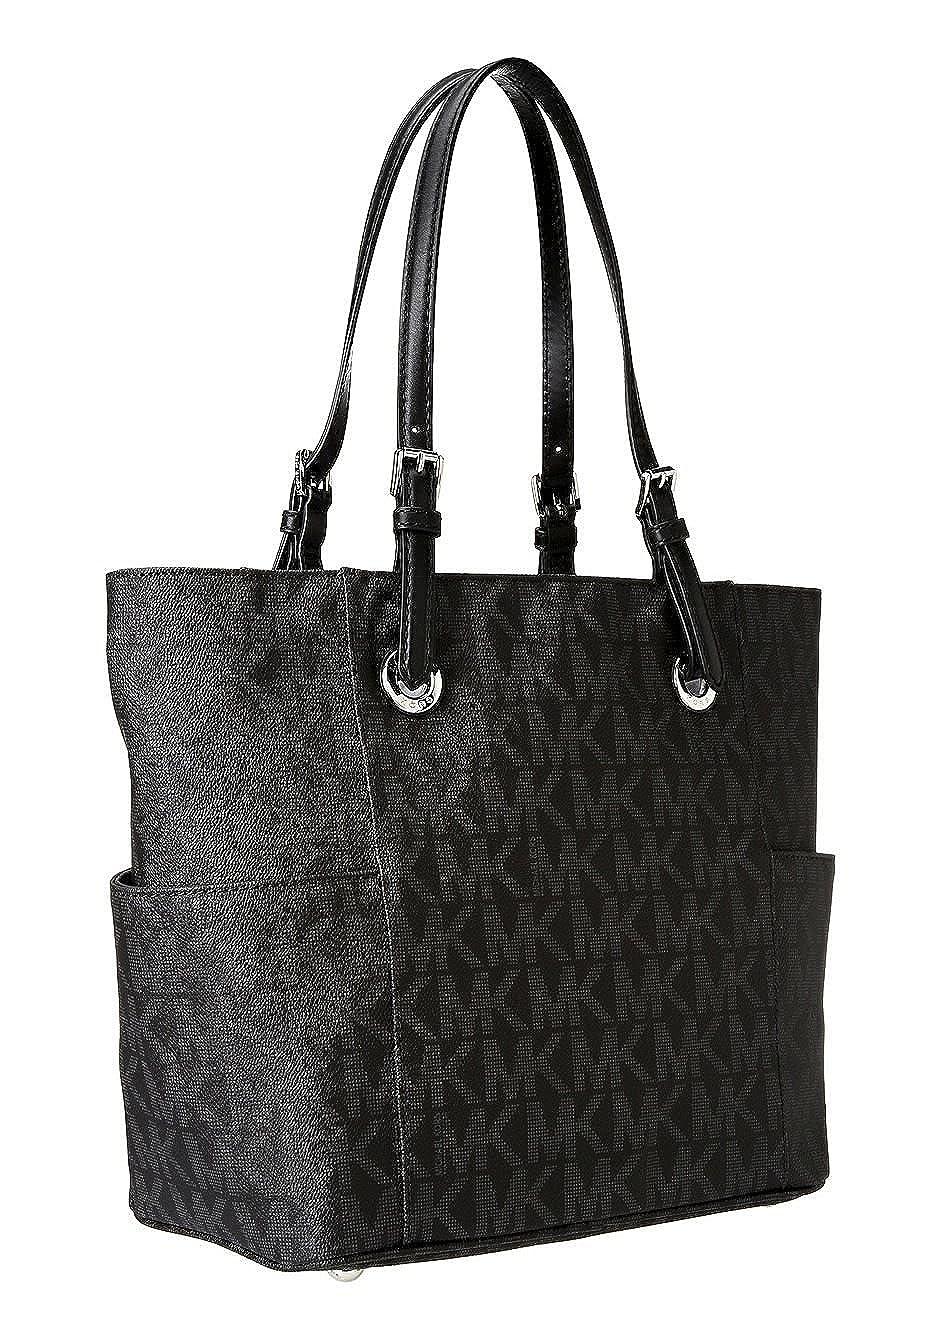 Michael Kors Signature Logo Tote in Black: Handbags: Amazon.com